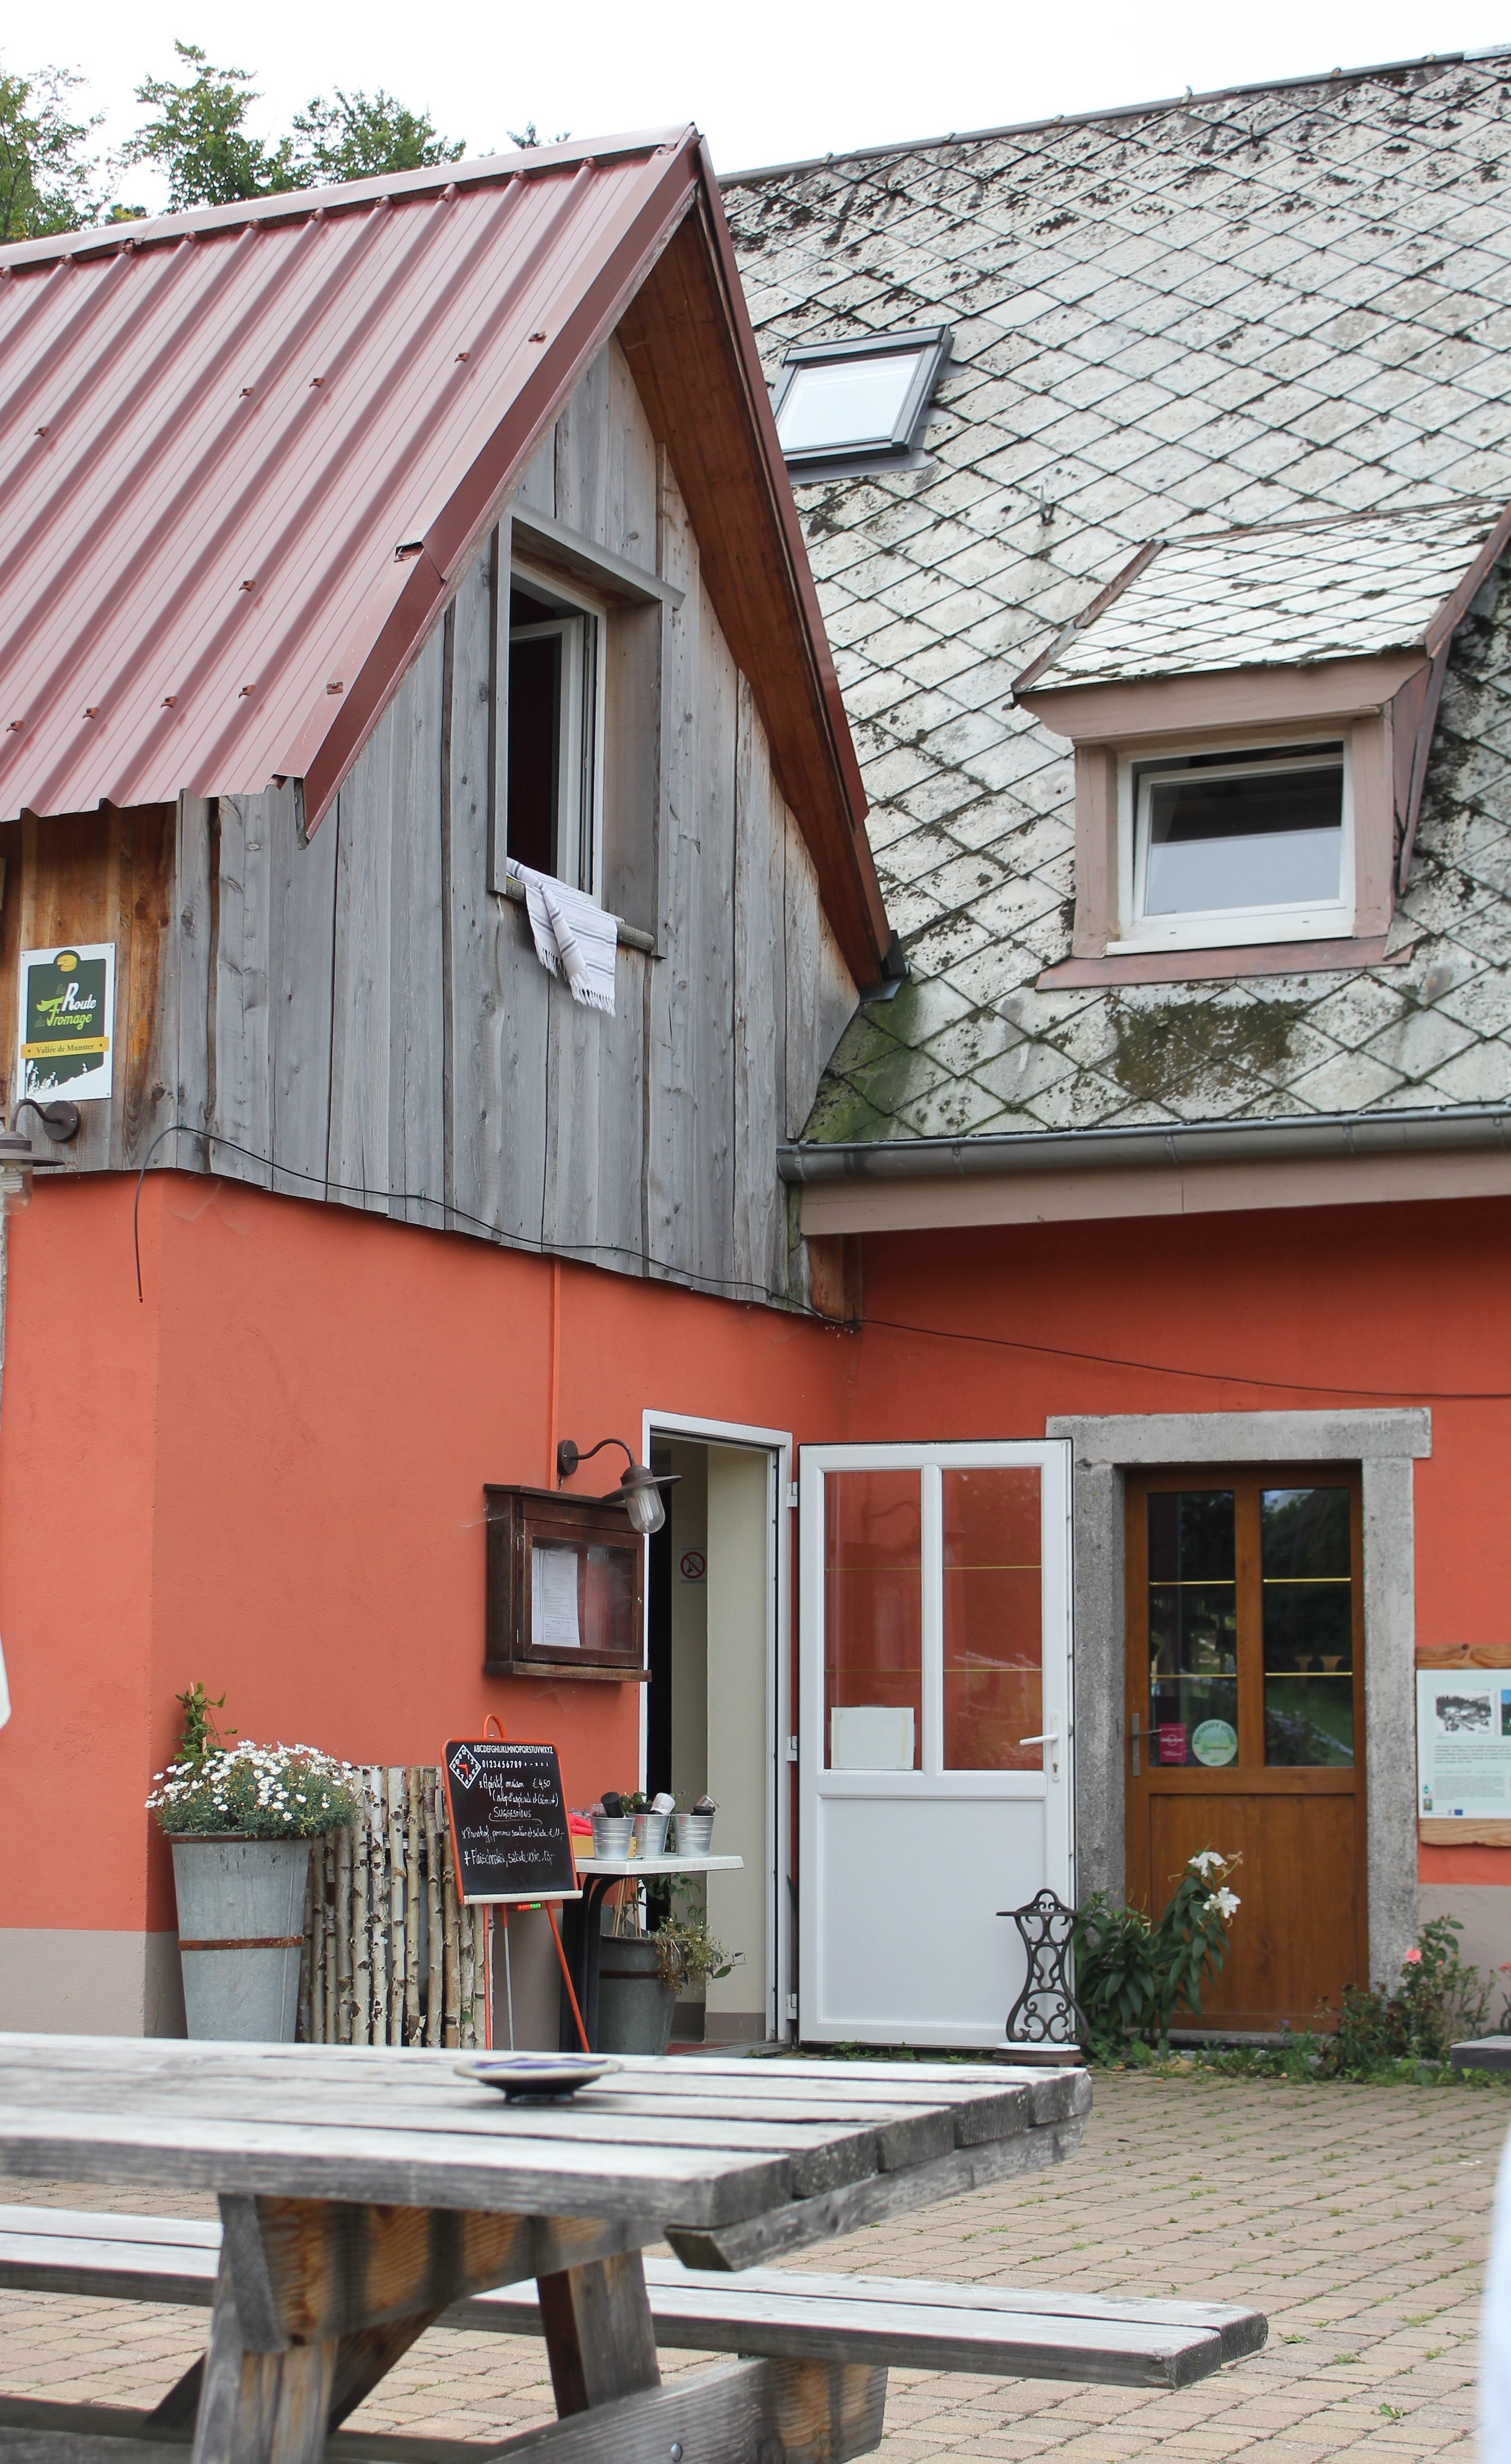 1. Ferme Auberge du Christlesgut -